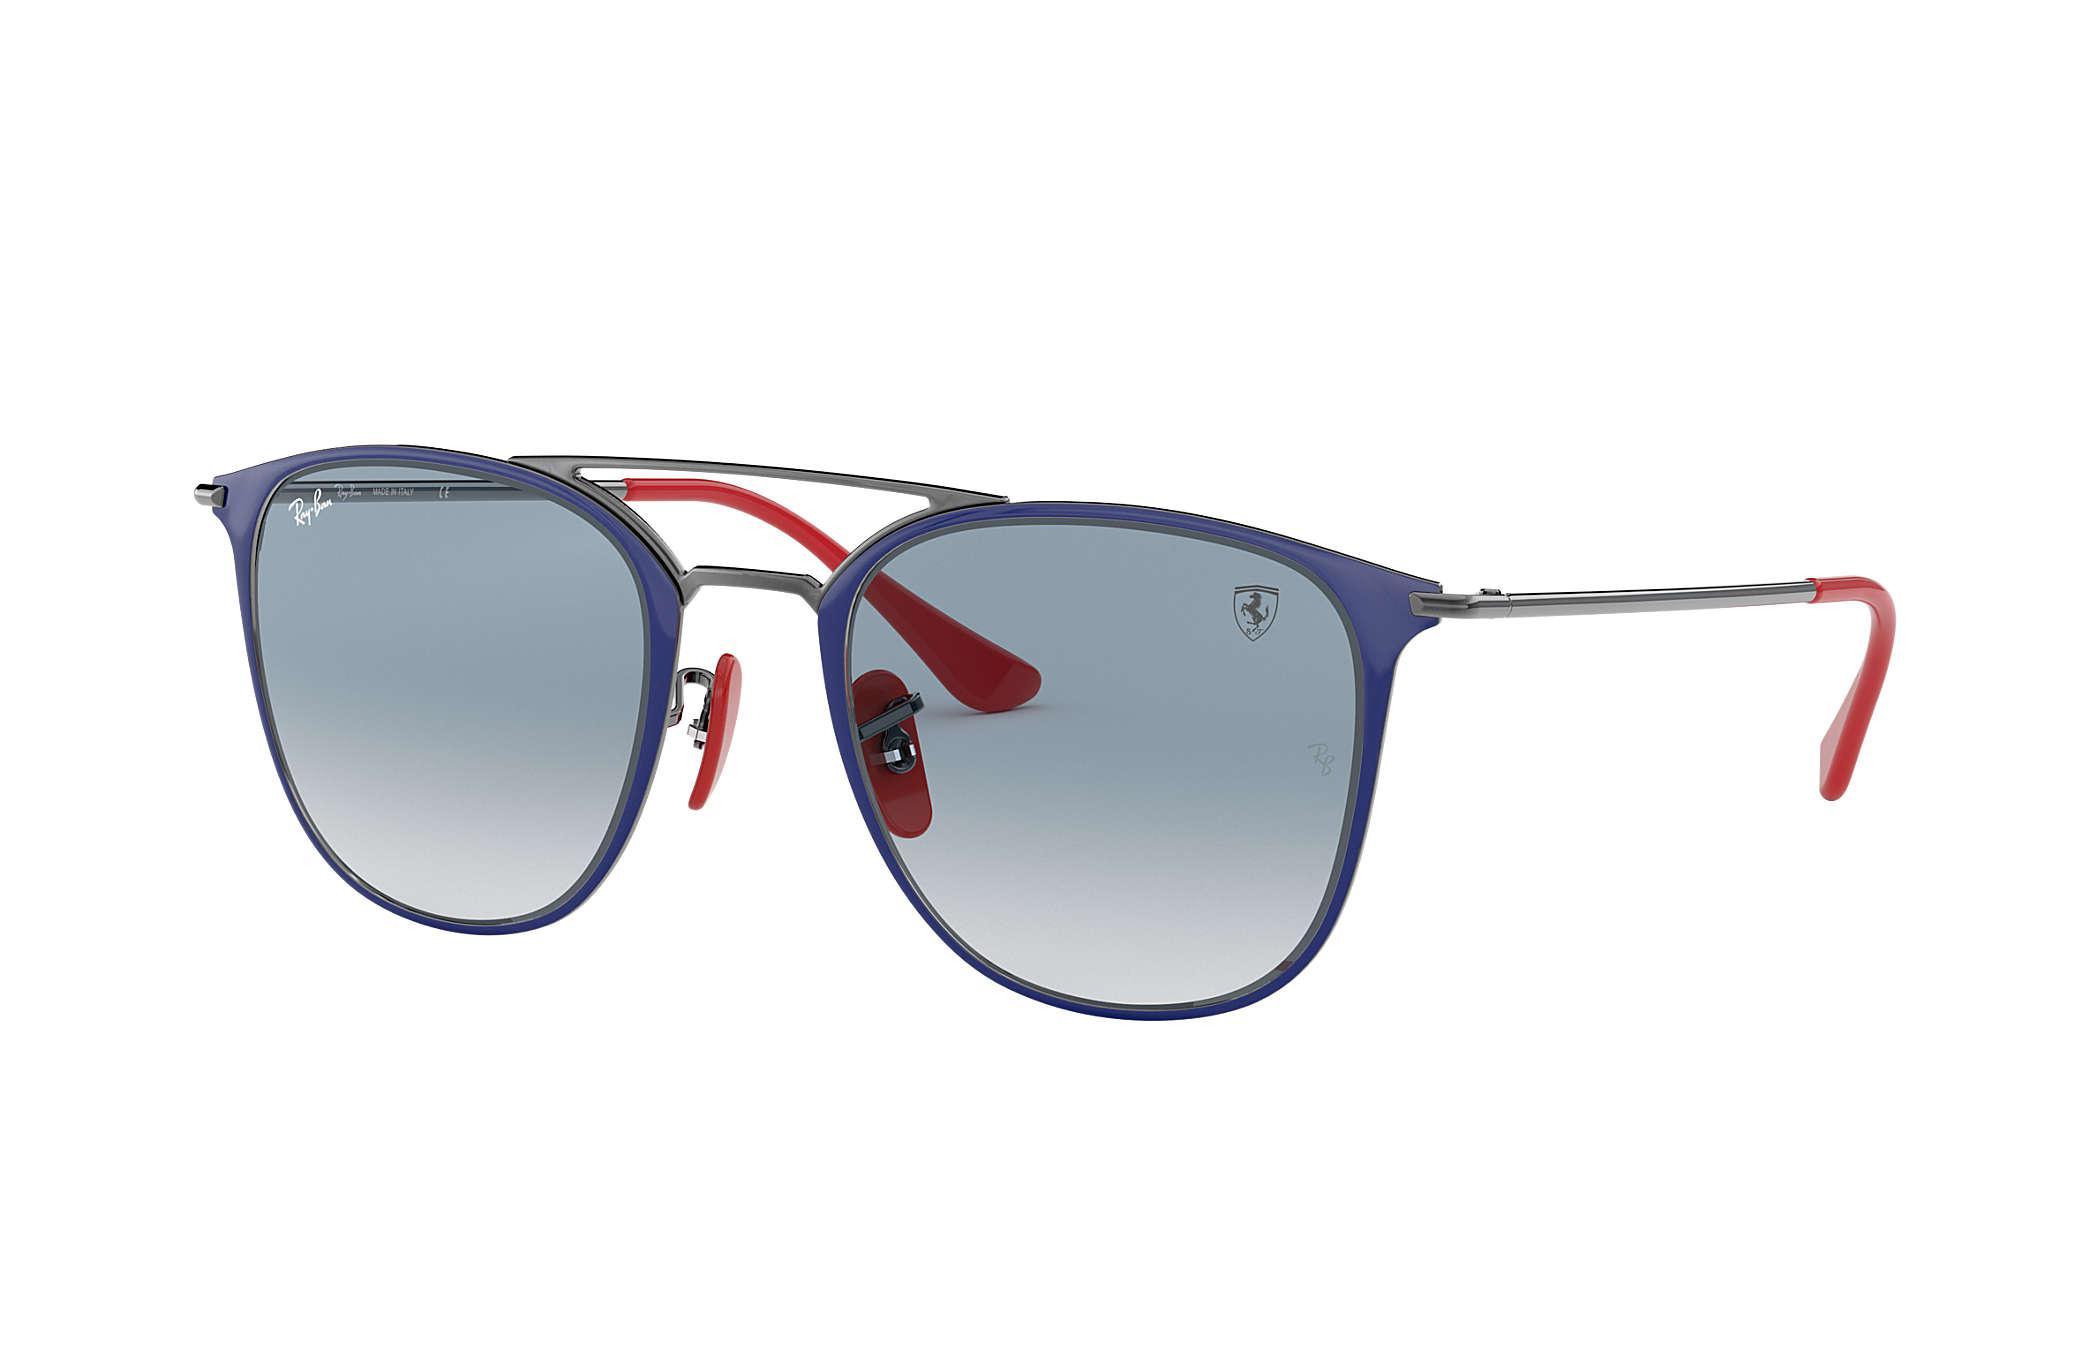 e046f358b0 Ray-Ban Scuderia Ferrari Collection Rb3601m in Blue for Men - Lyst